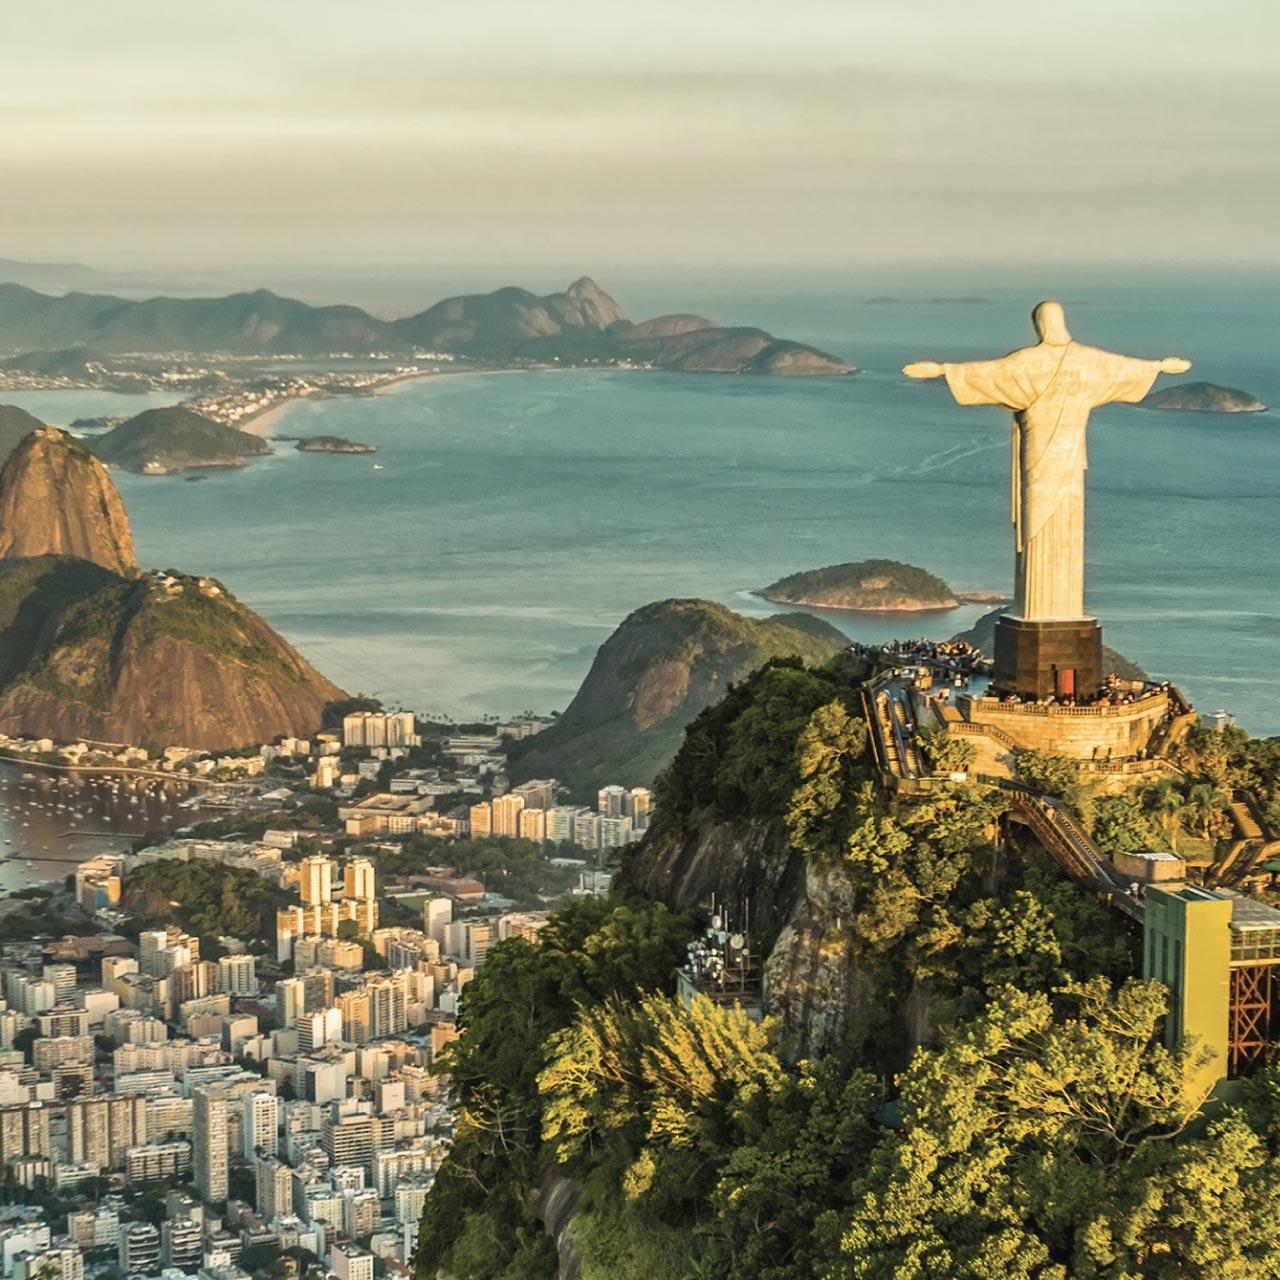 https://usercontent.one/wp/www.southtravelers.com/wp-content/uploads/2019/10/Brazil.jpg